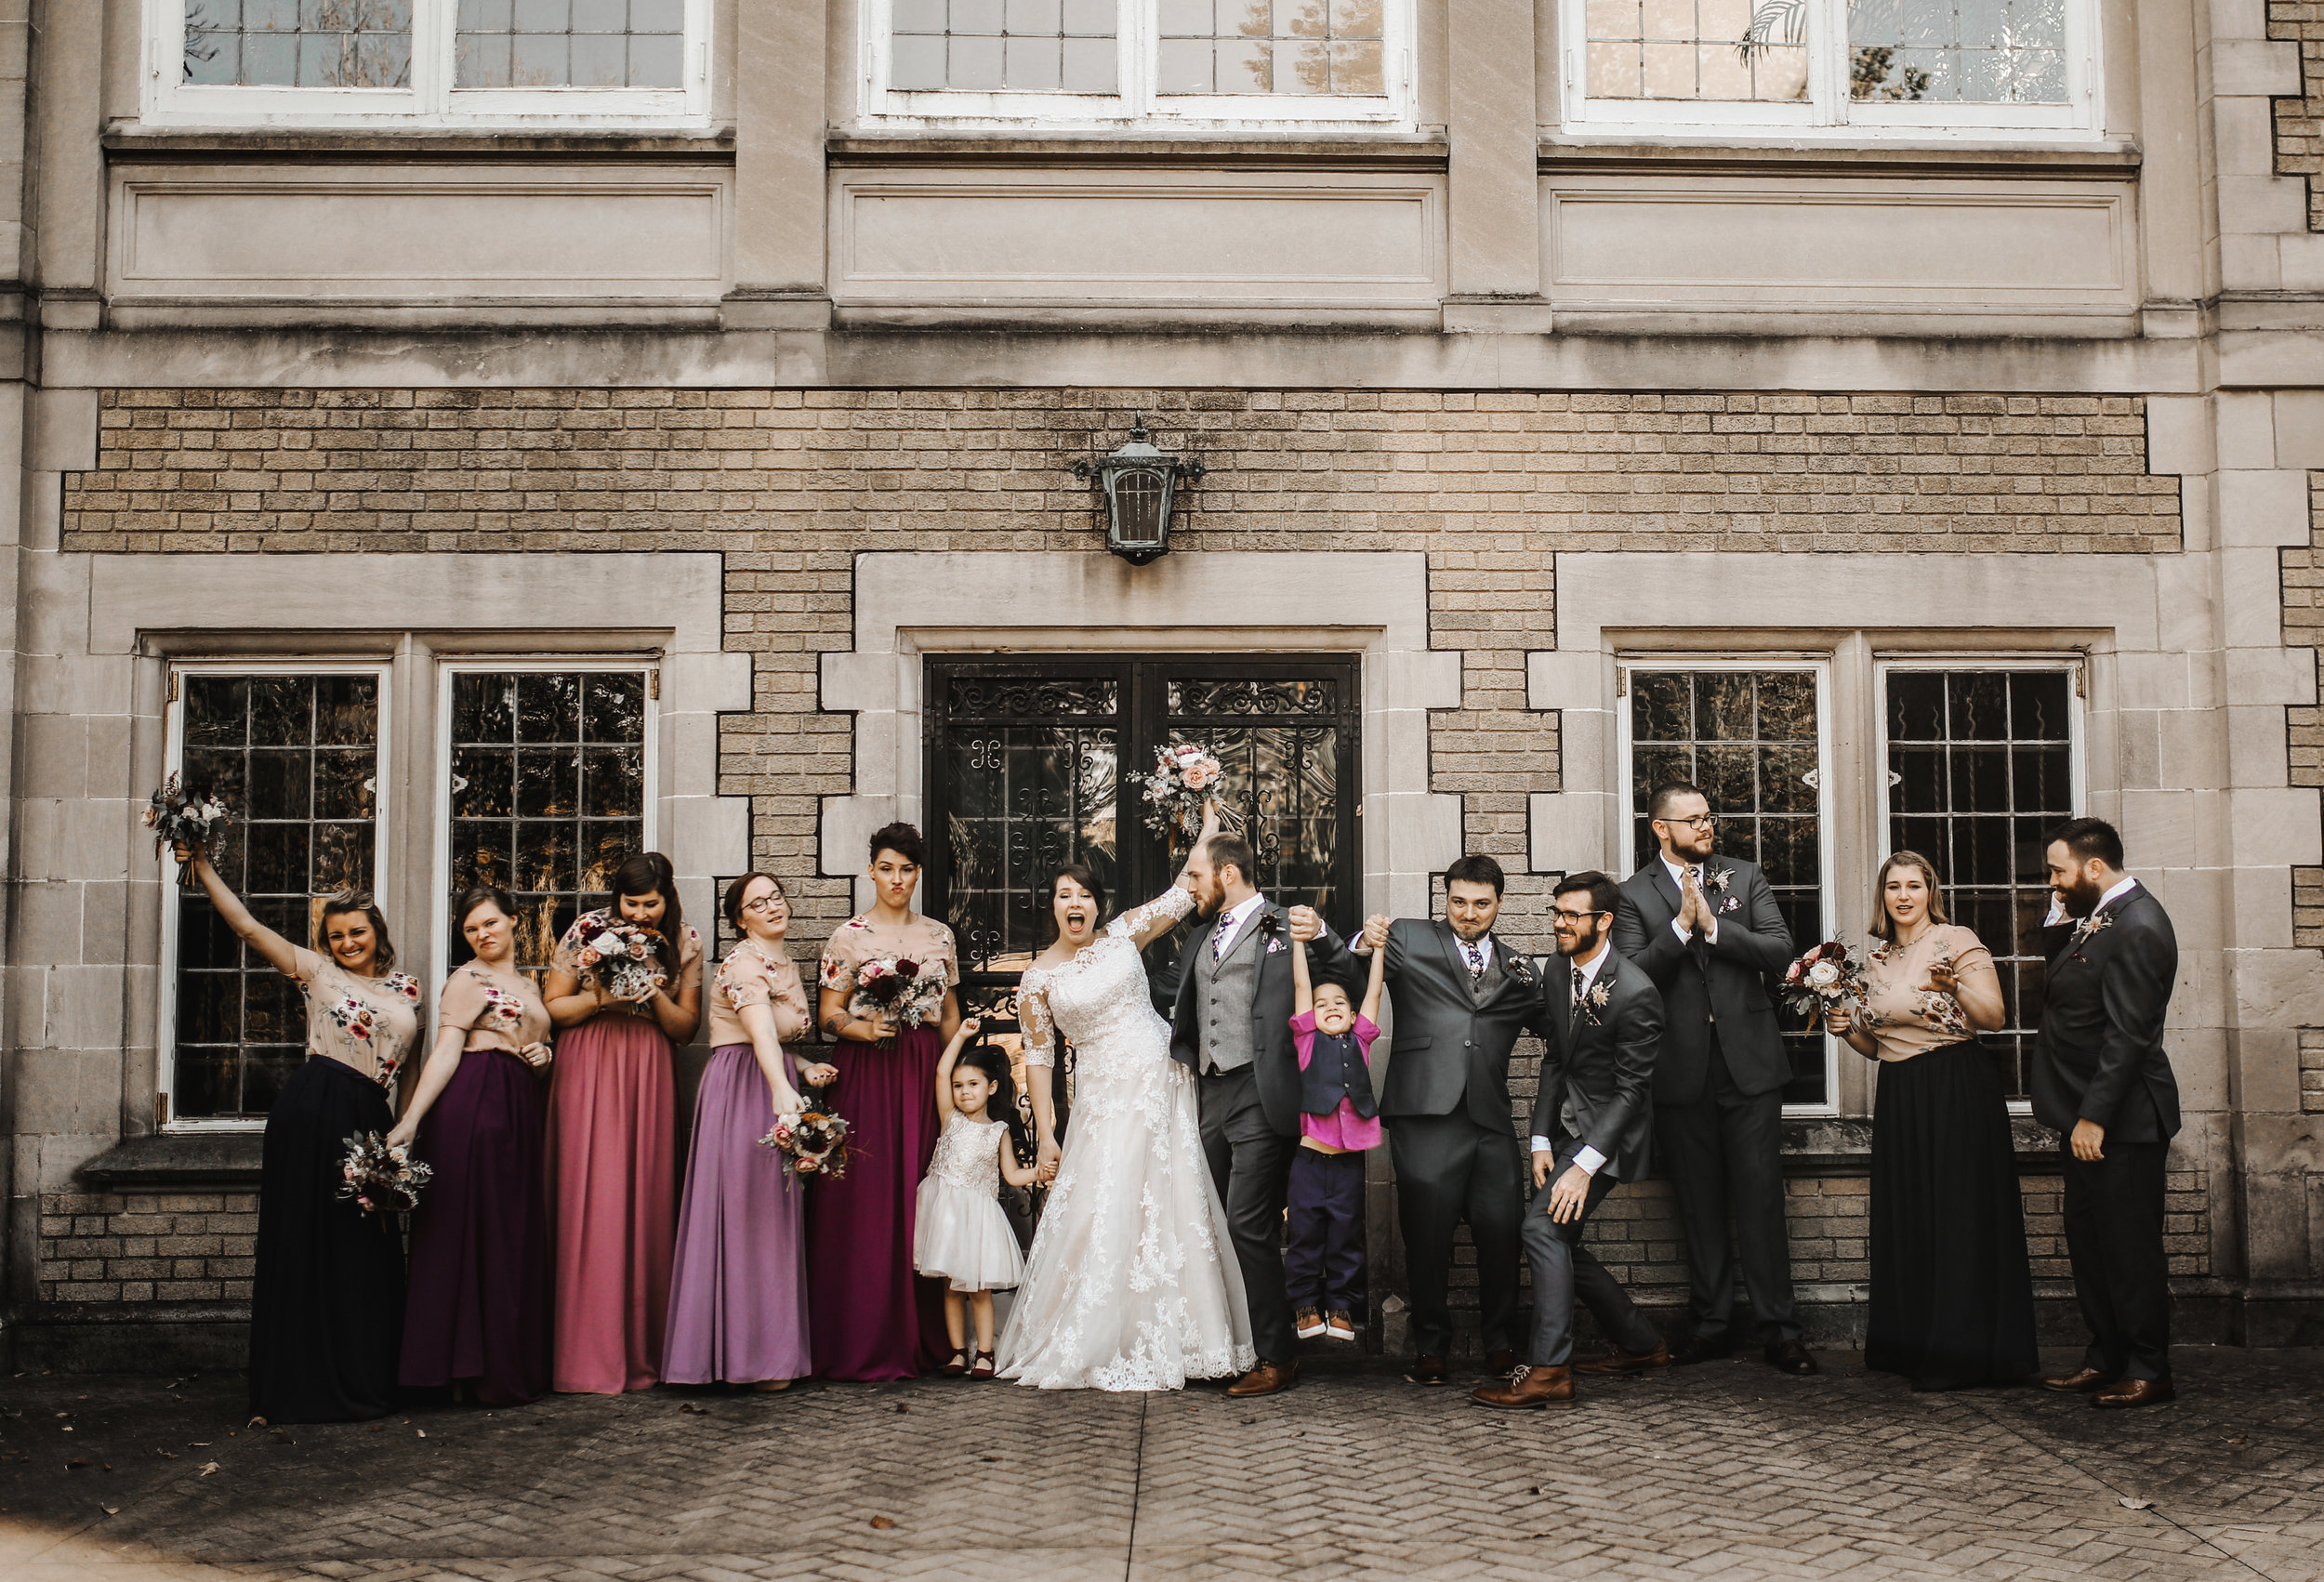 LDP_McNeiveWedding_WeddingParty_078.JPG